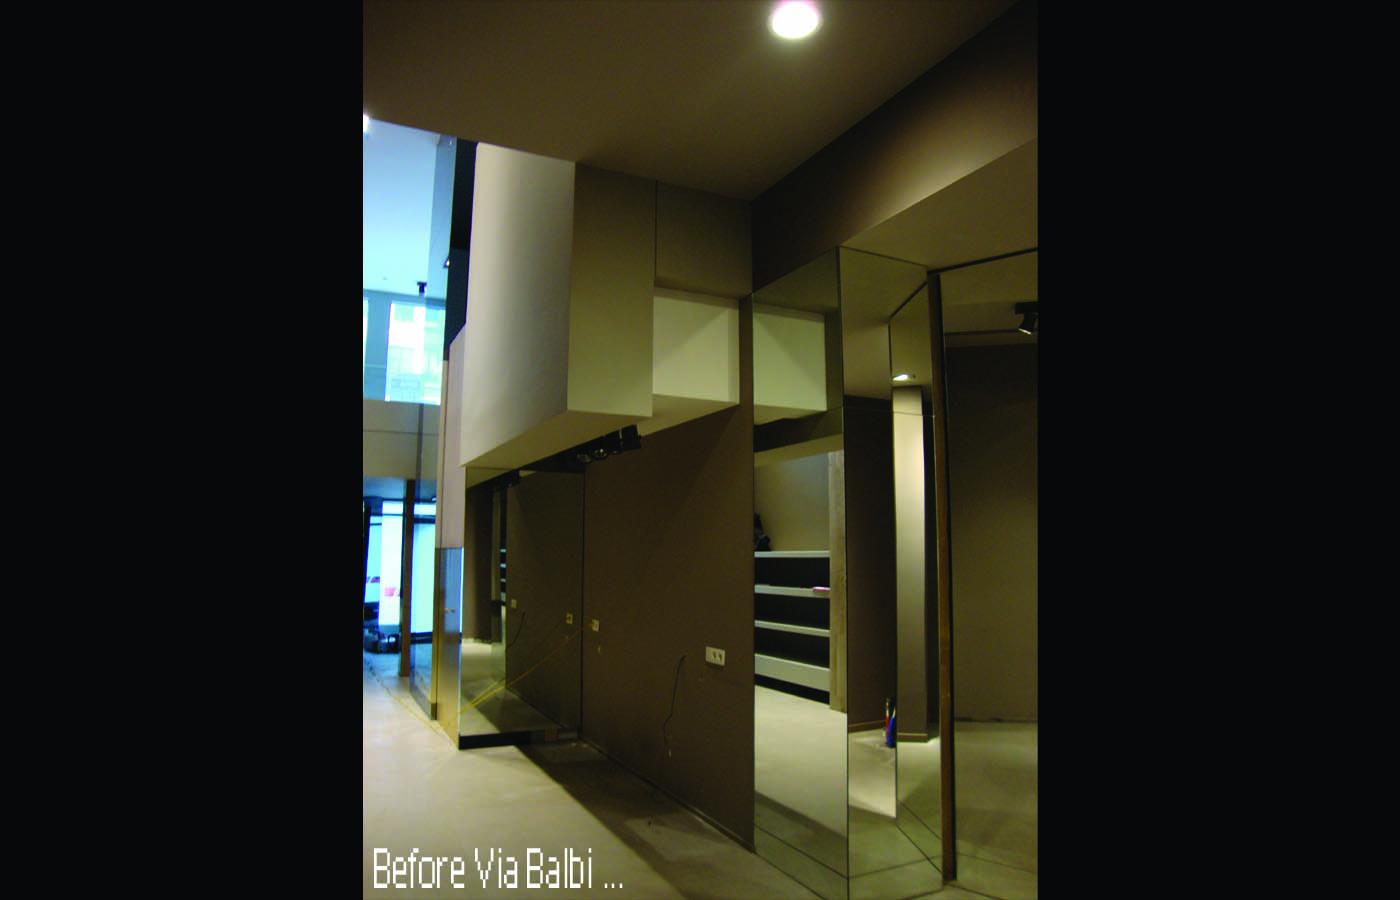 An_Swinnen_Architect_Via_Balbi_4.jpg